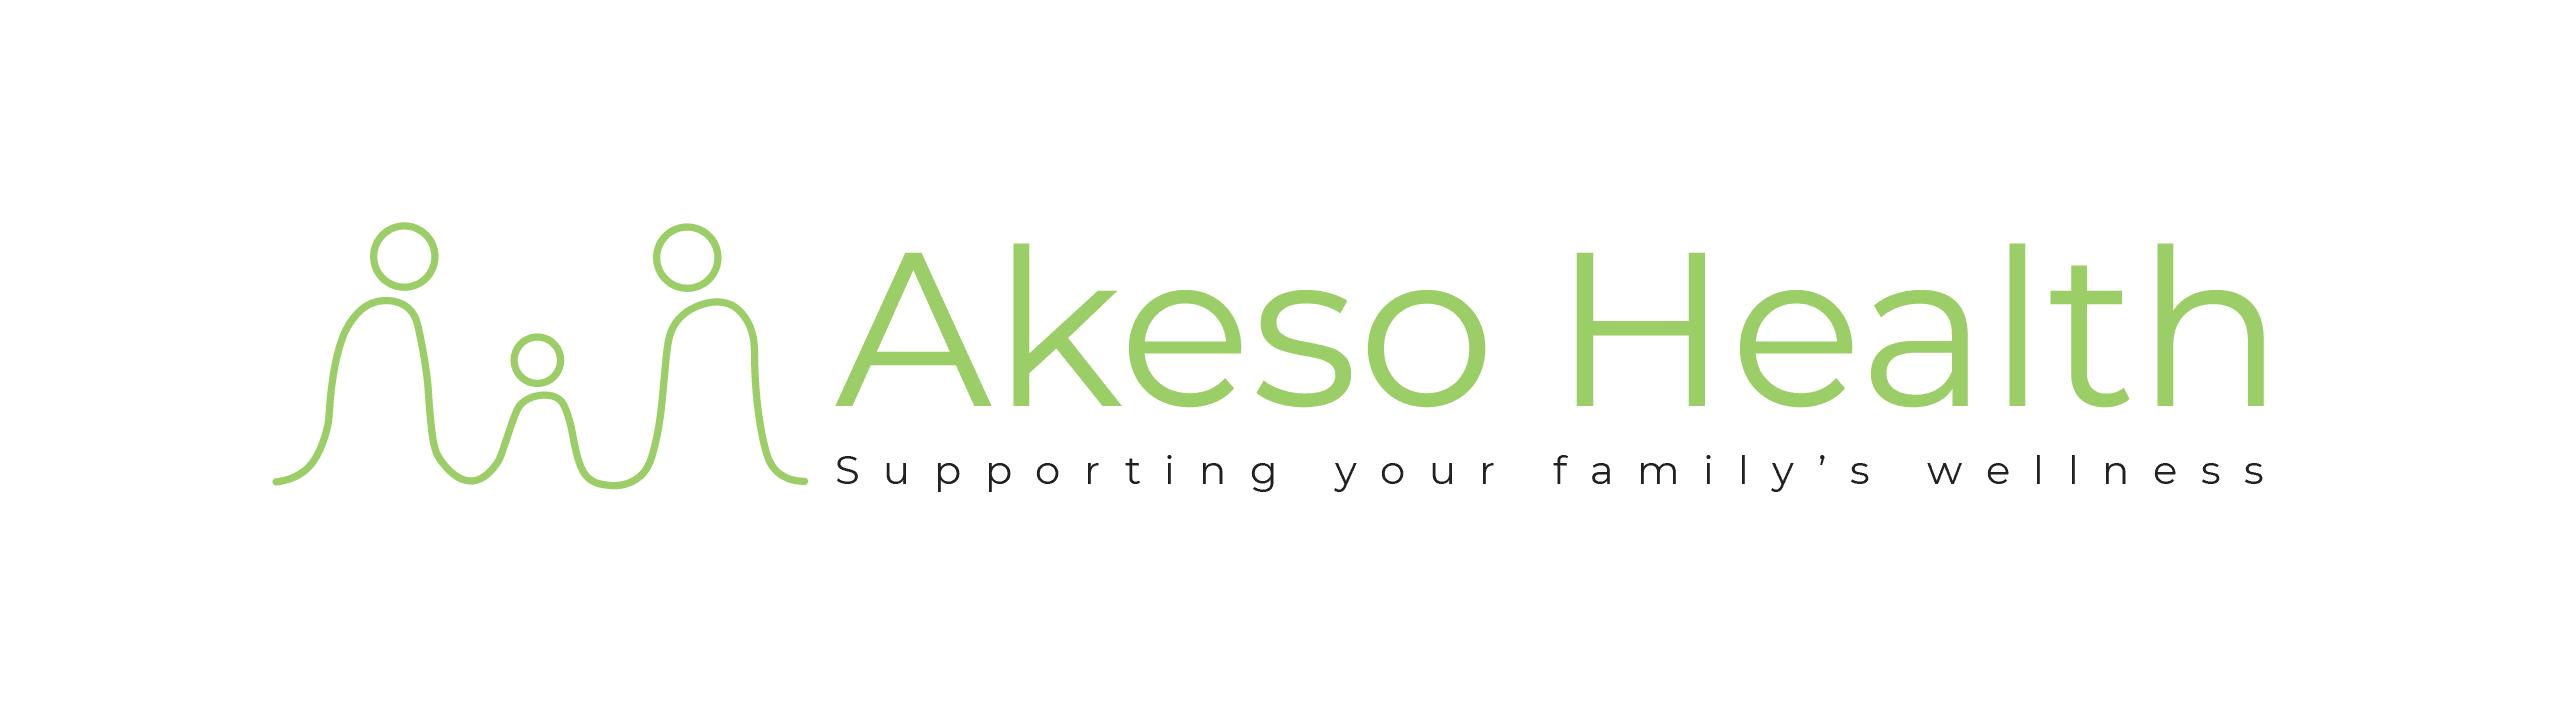 Akeso Health